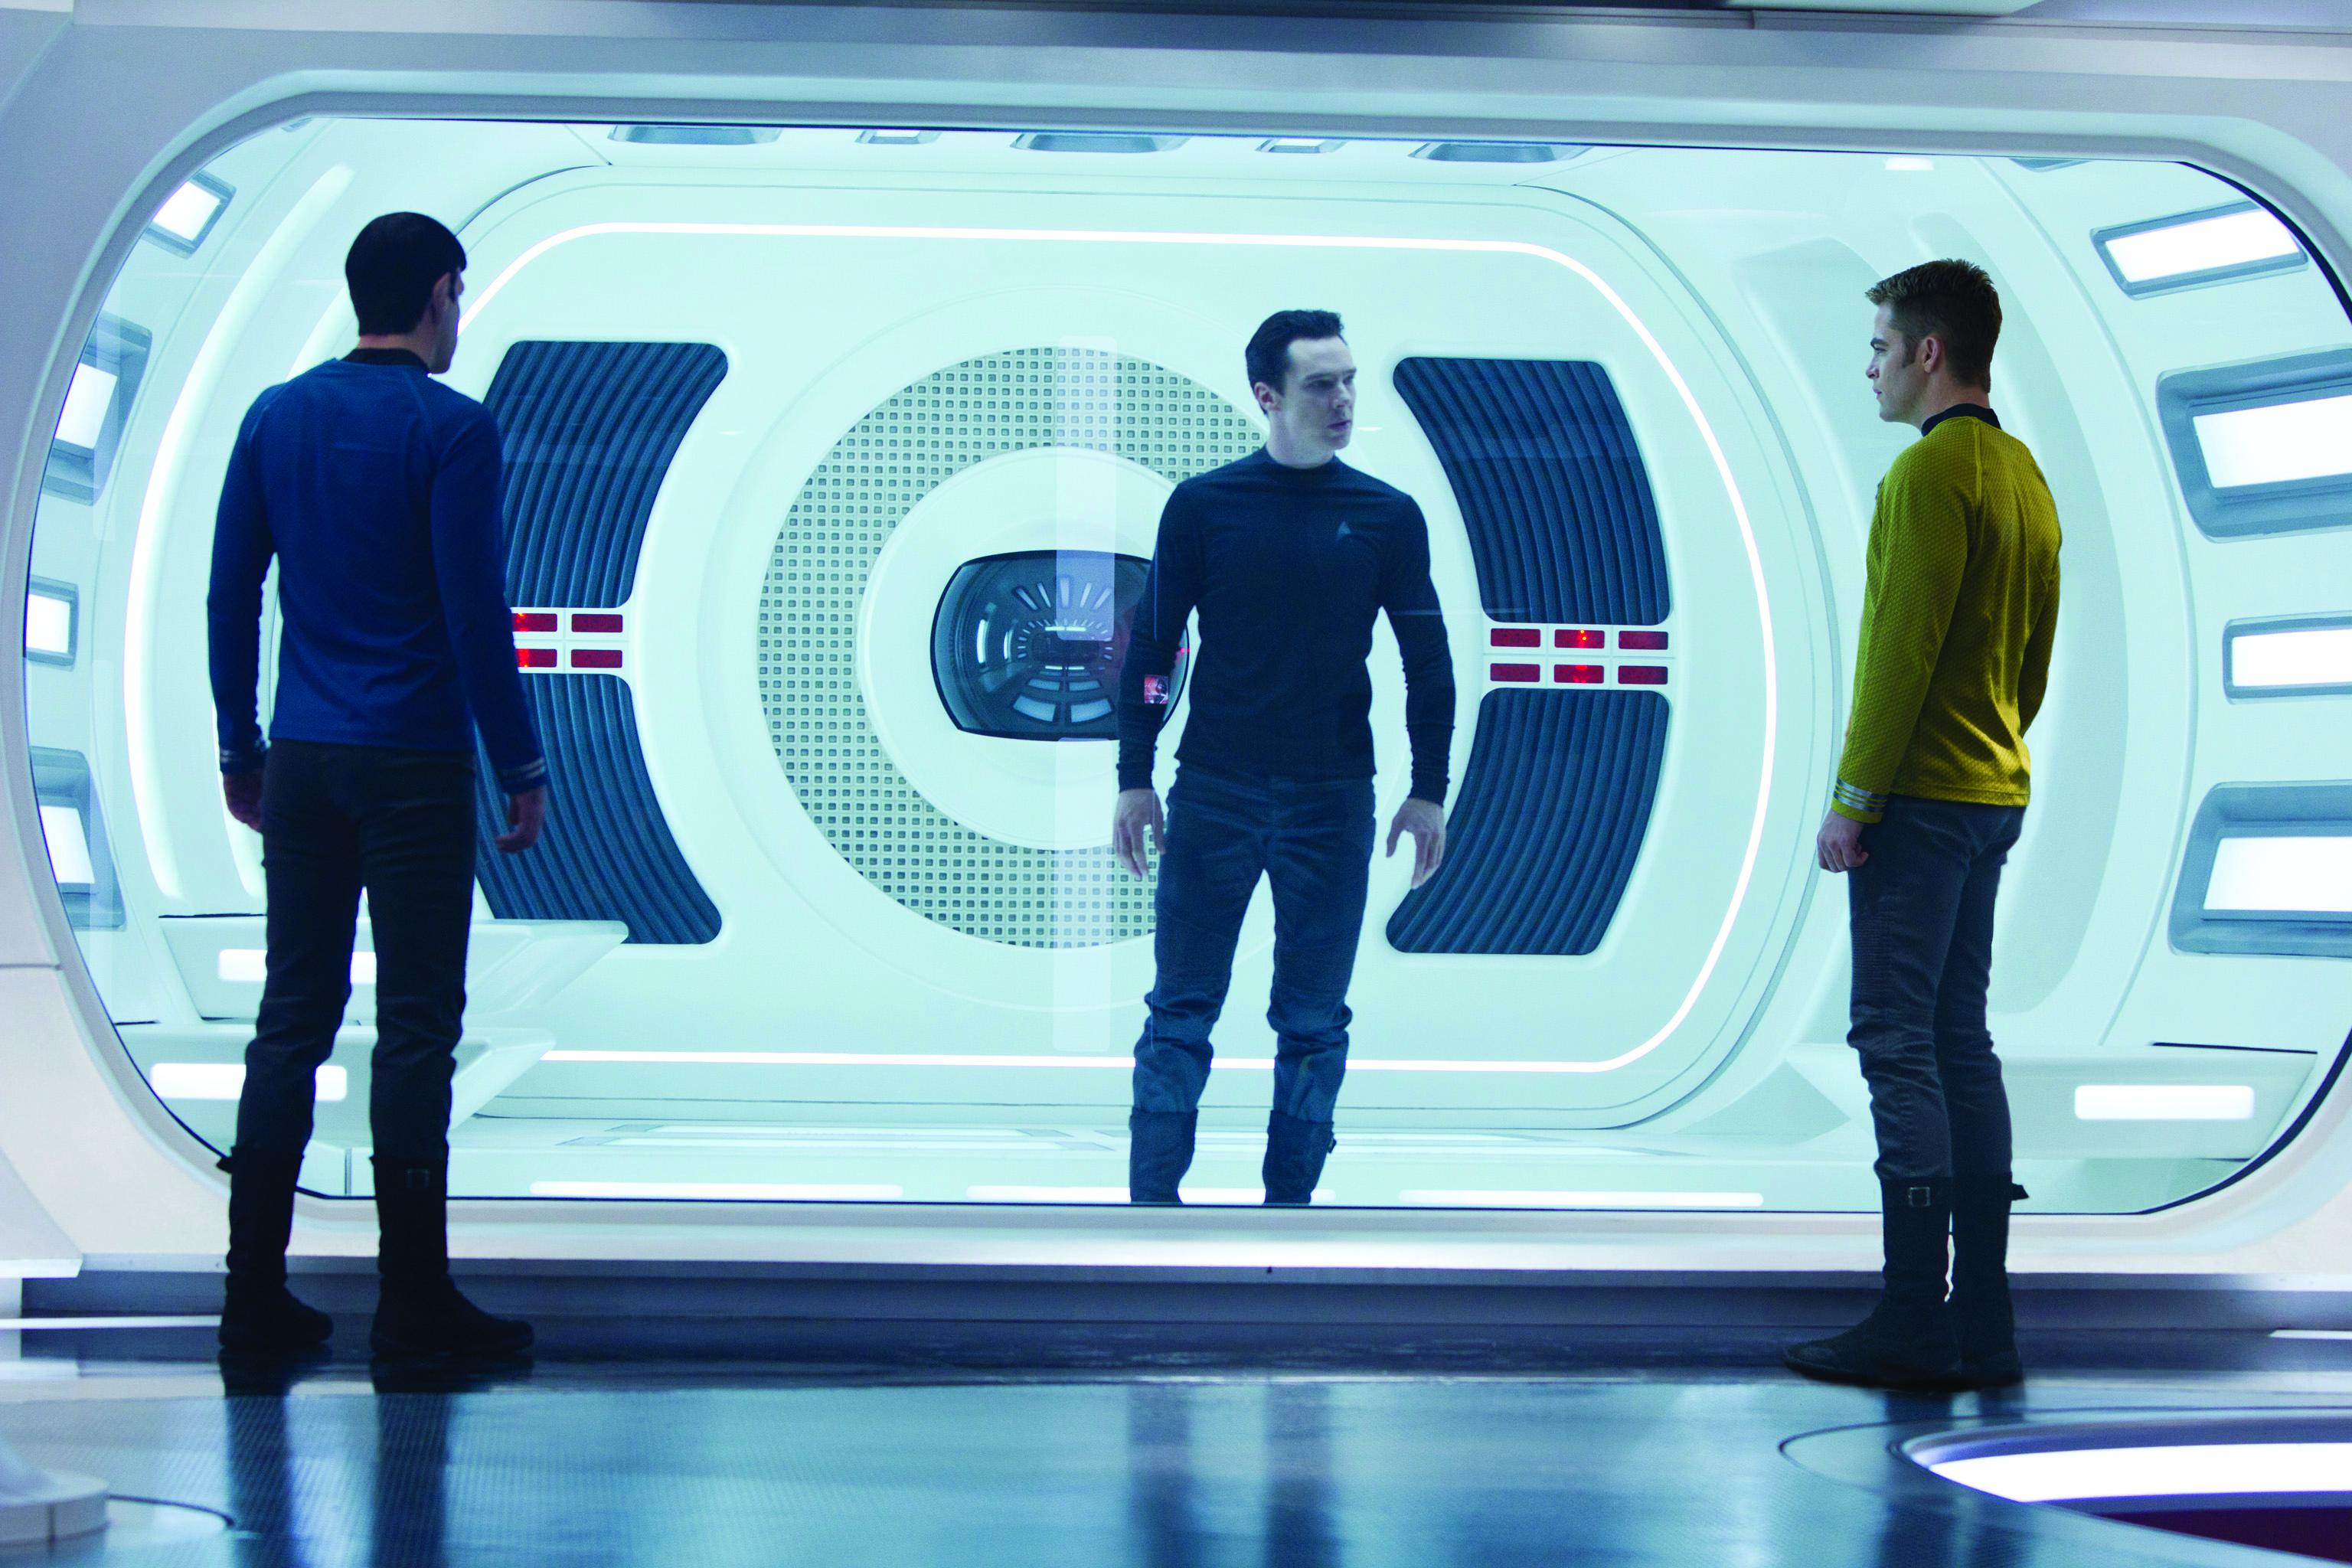 Star Trek Into Darkness is breathtaking rollercoaster that locks you in a Vulcan death grip